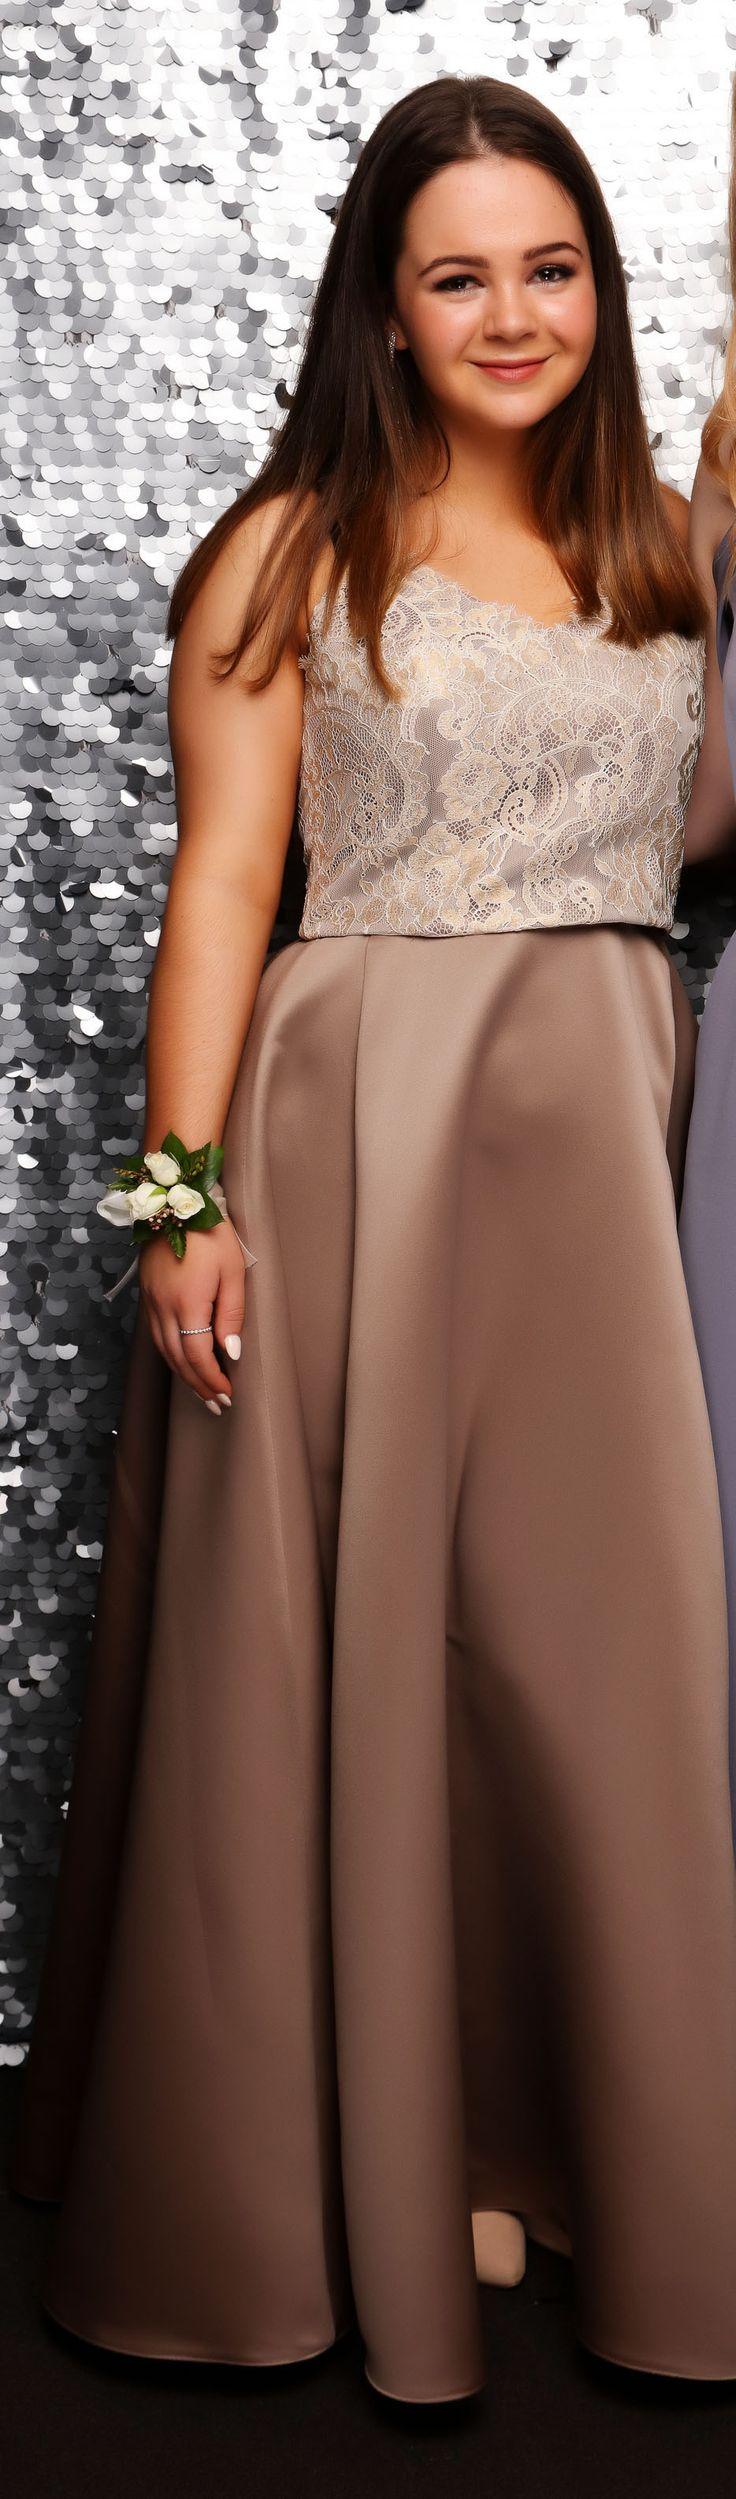 Glendowie School Ball 2017. Adore this feminine look!